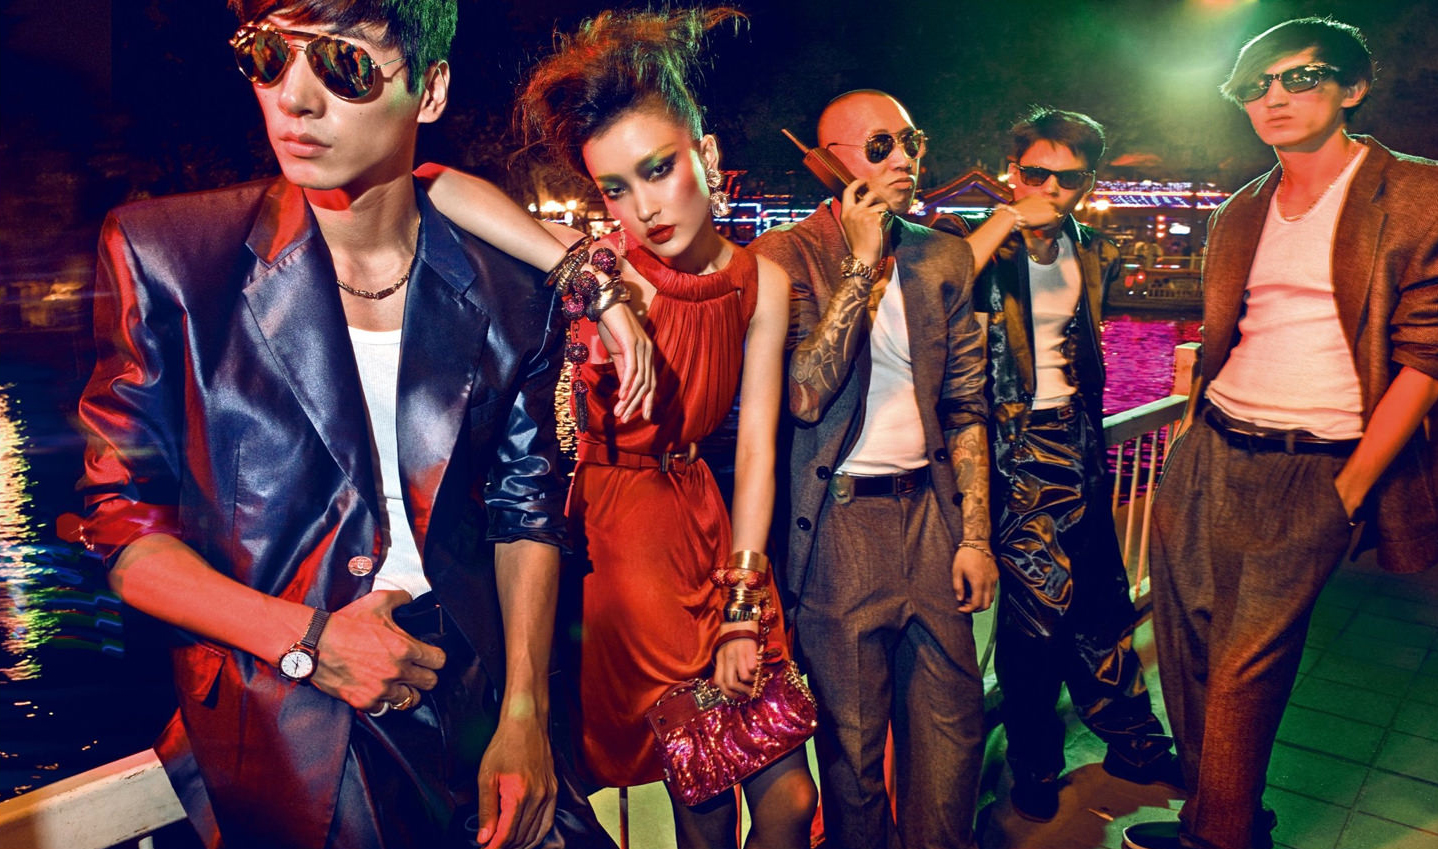 Chen Man - Photographer Interview